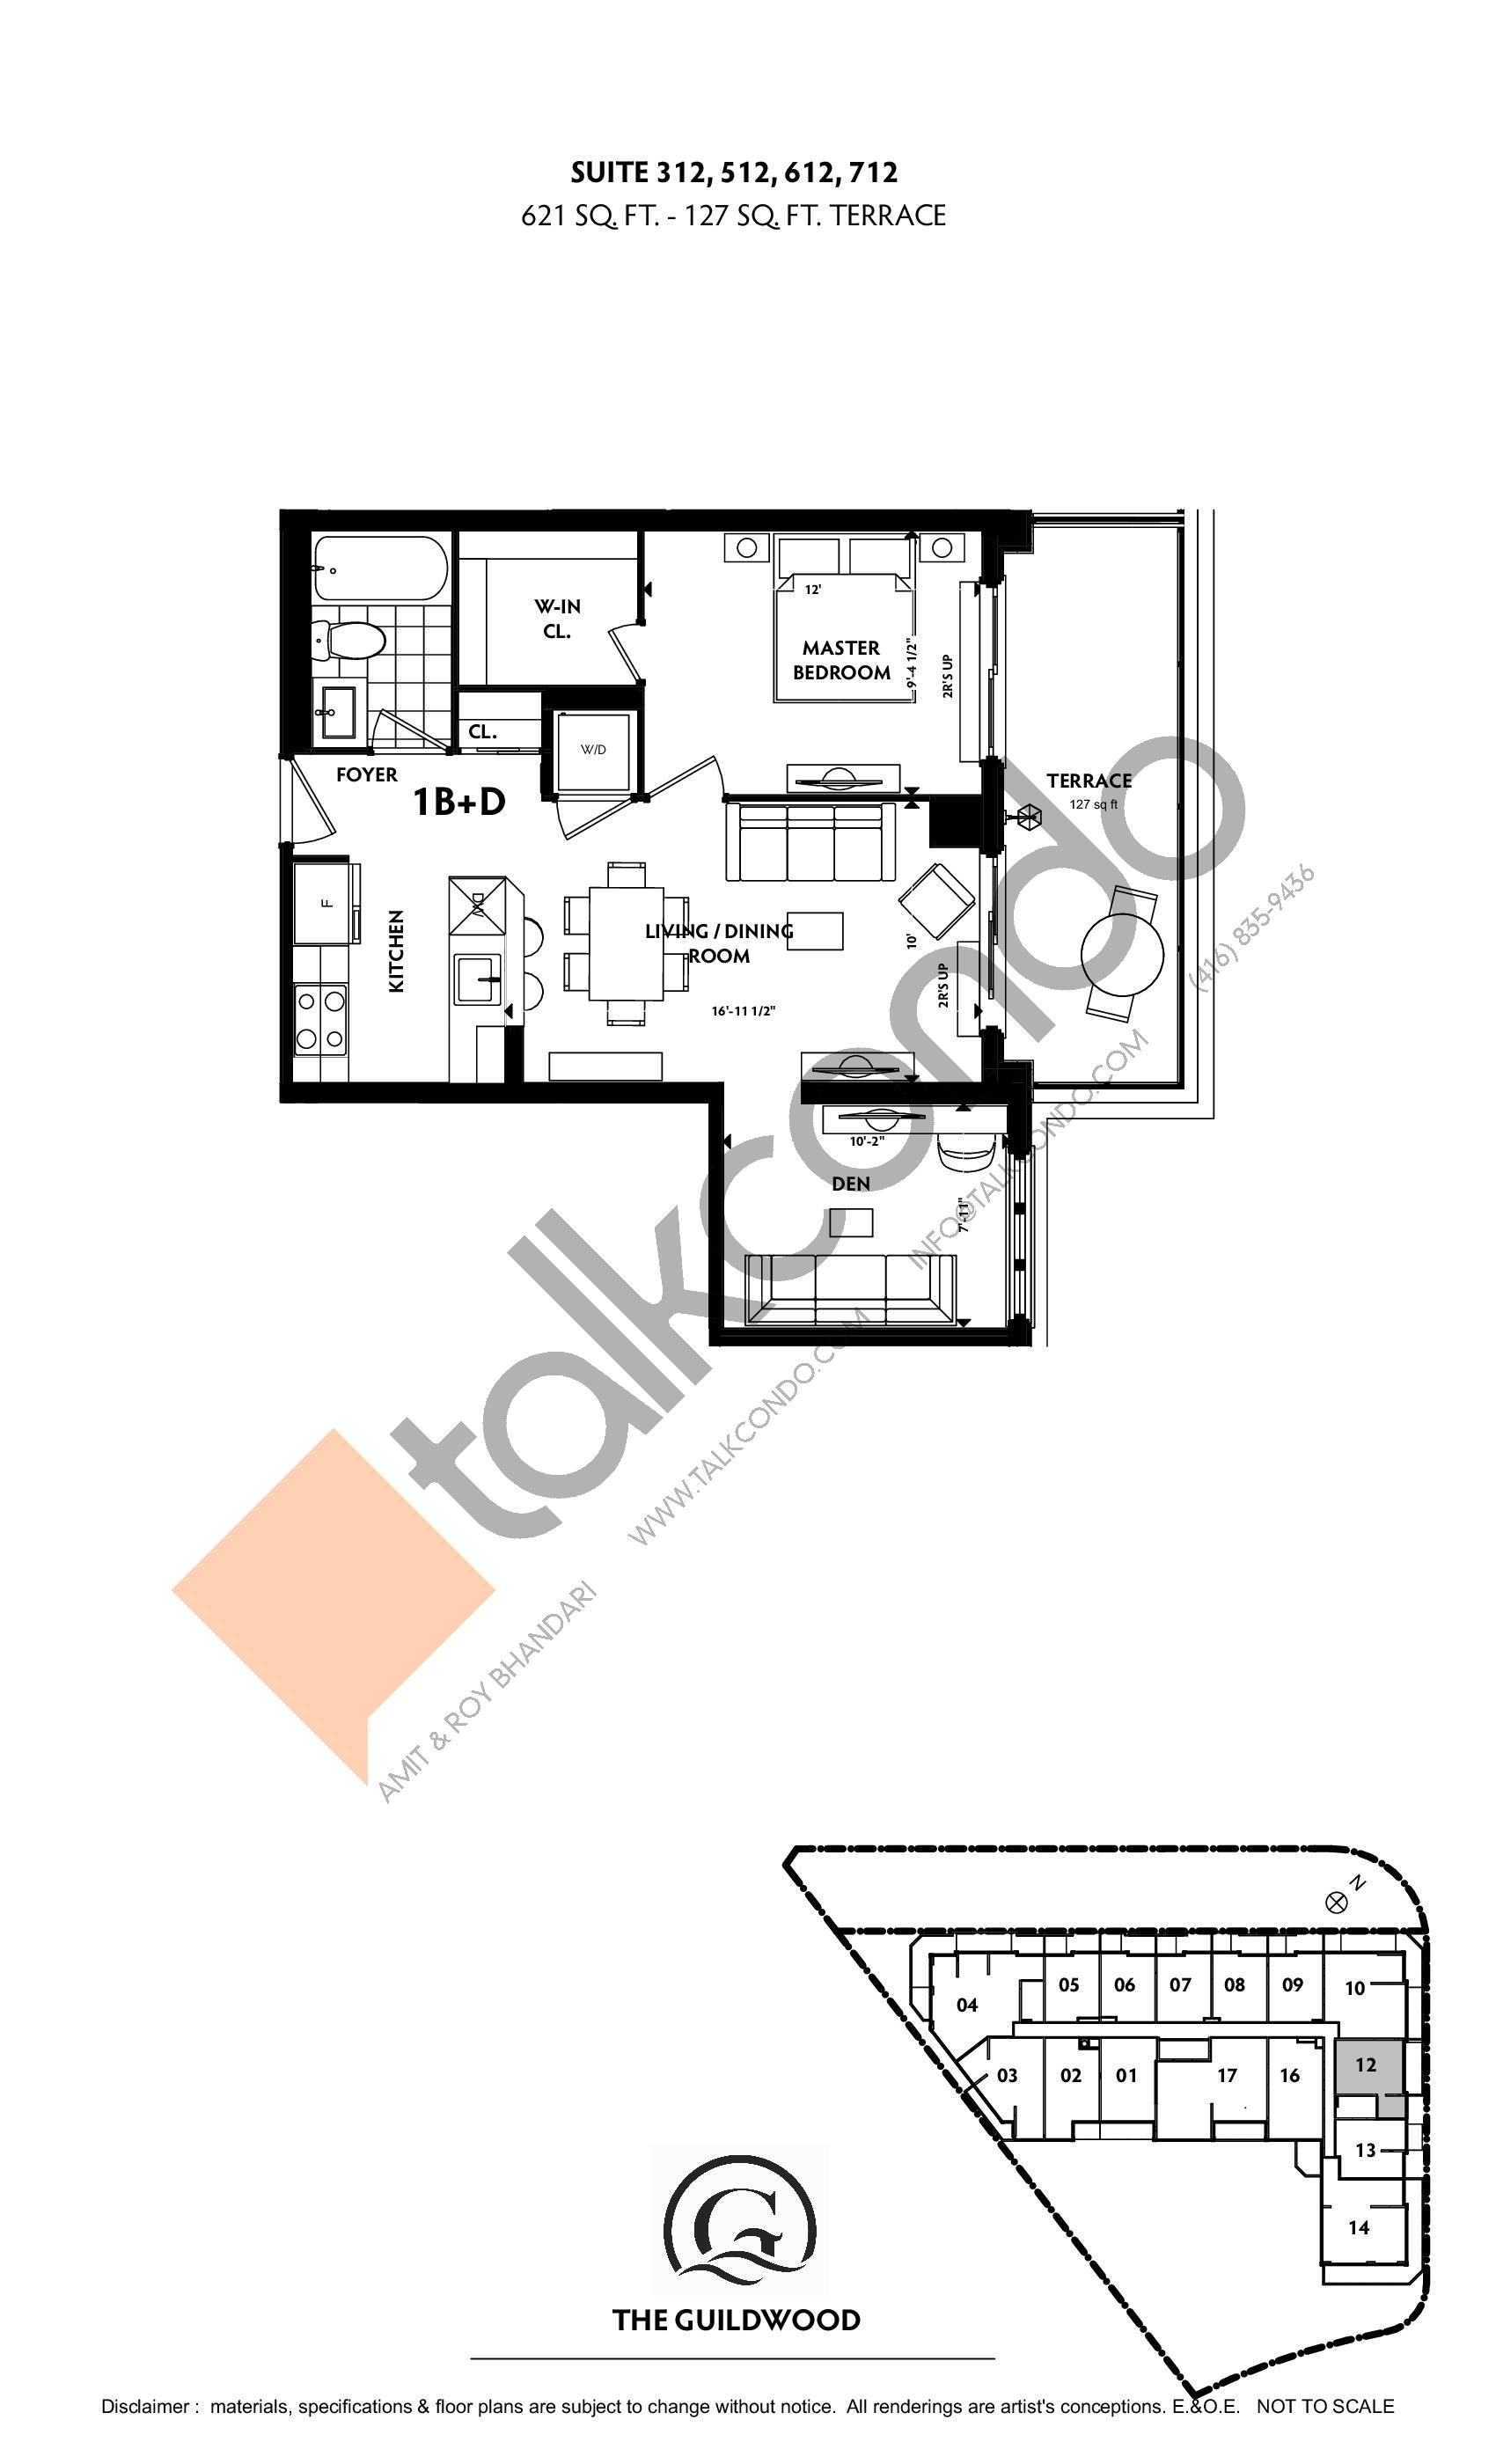 Suite 312, 512, 612, 712 Floor Plan at Guildwood Condos - 621 sq.ft